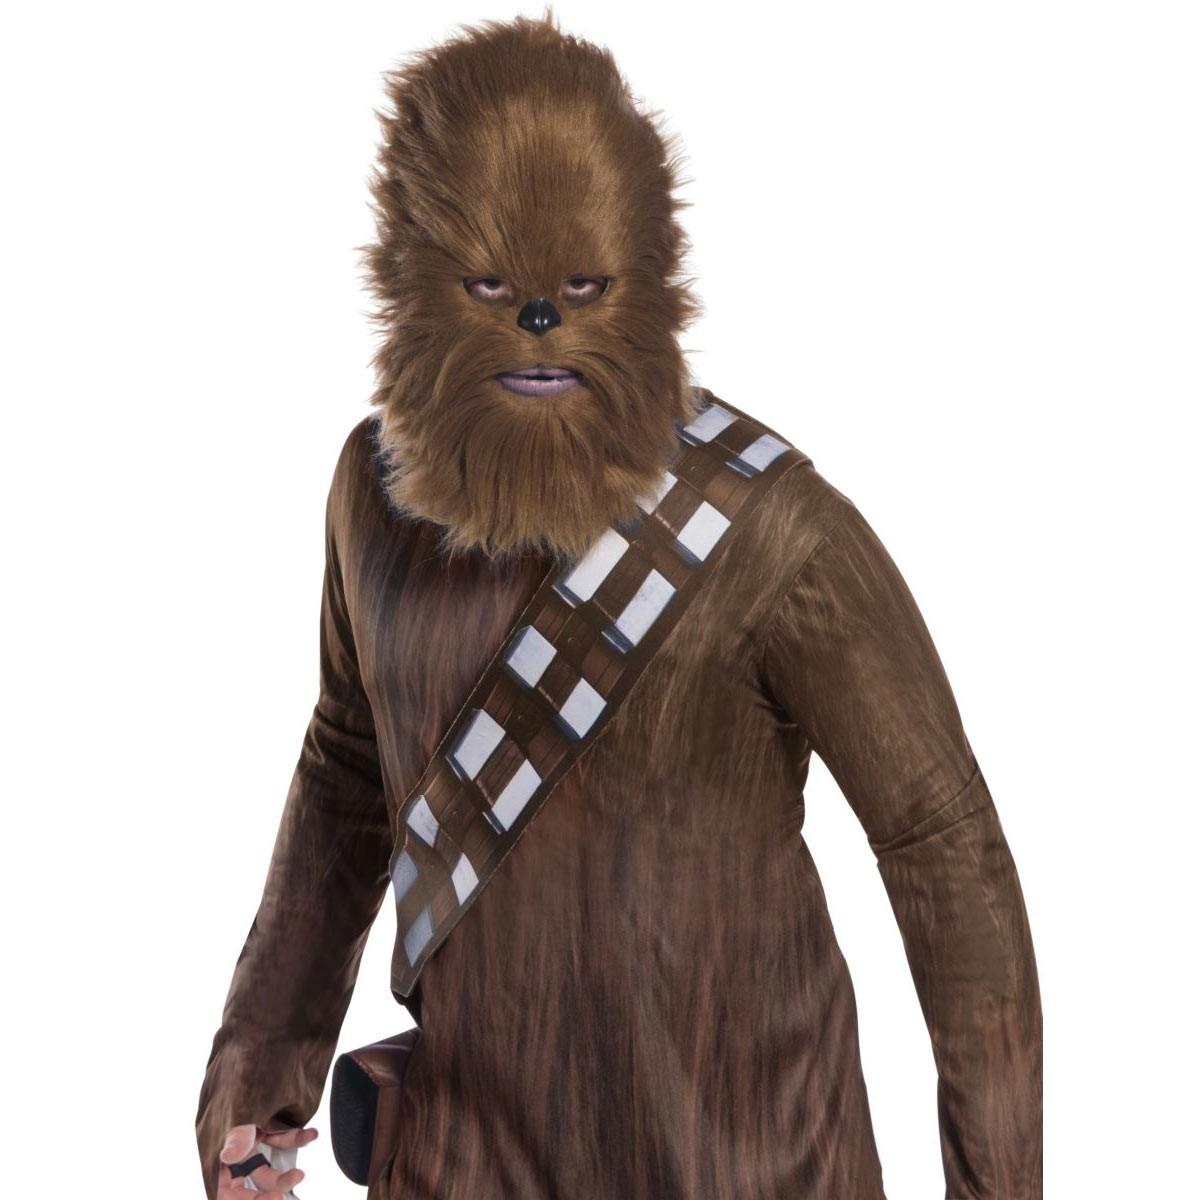 Star Wars Chewy Chewbacca Fur Half Mask